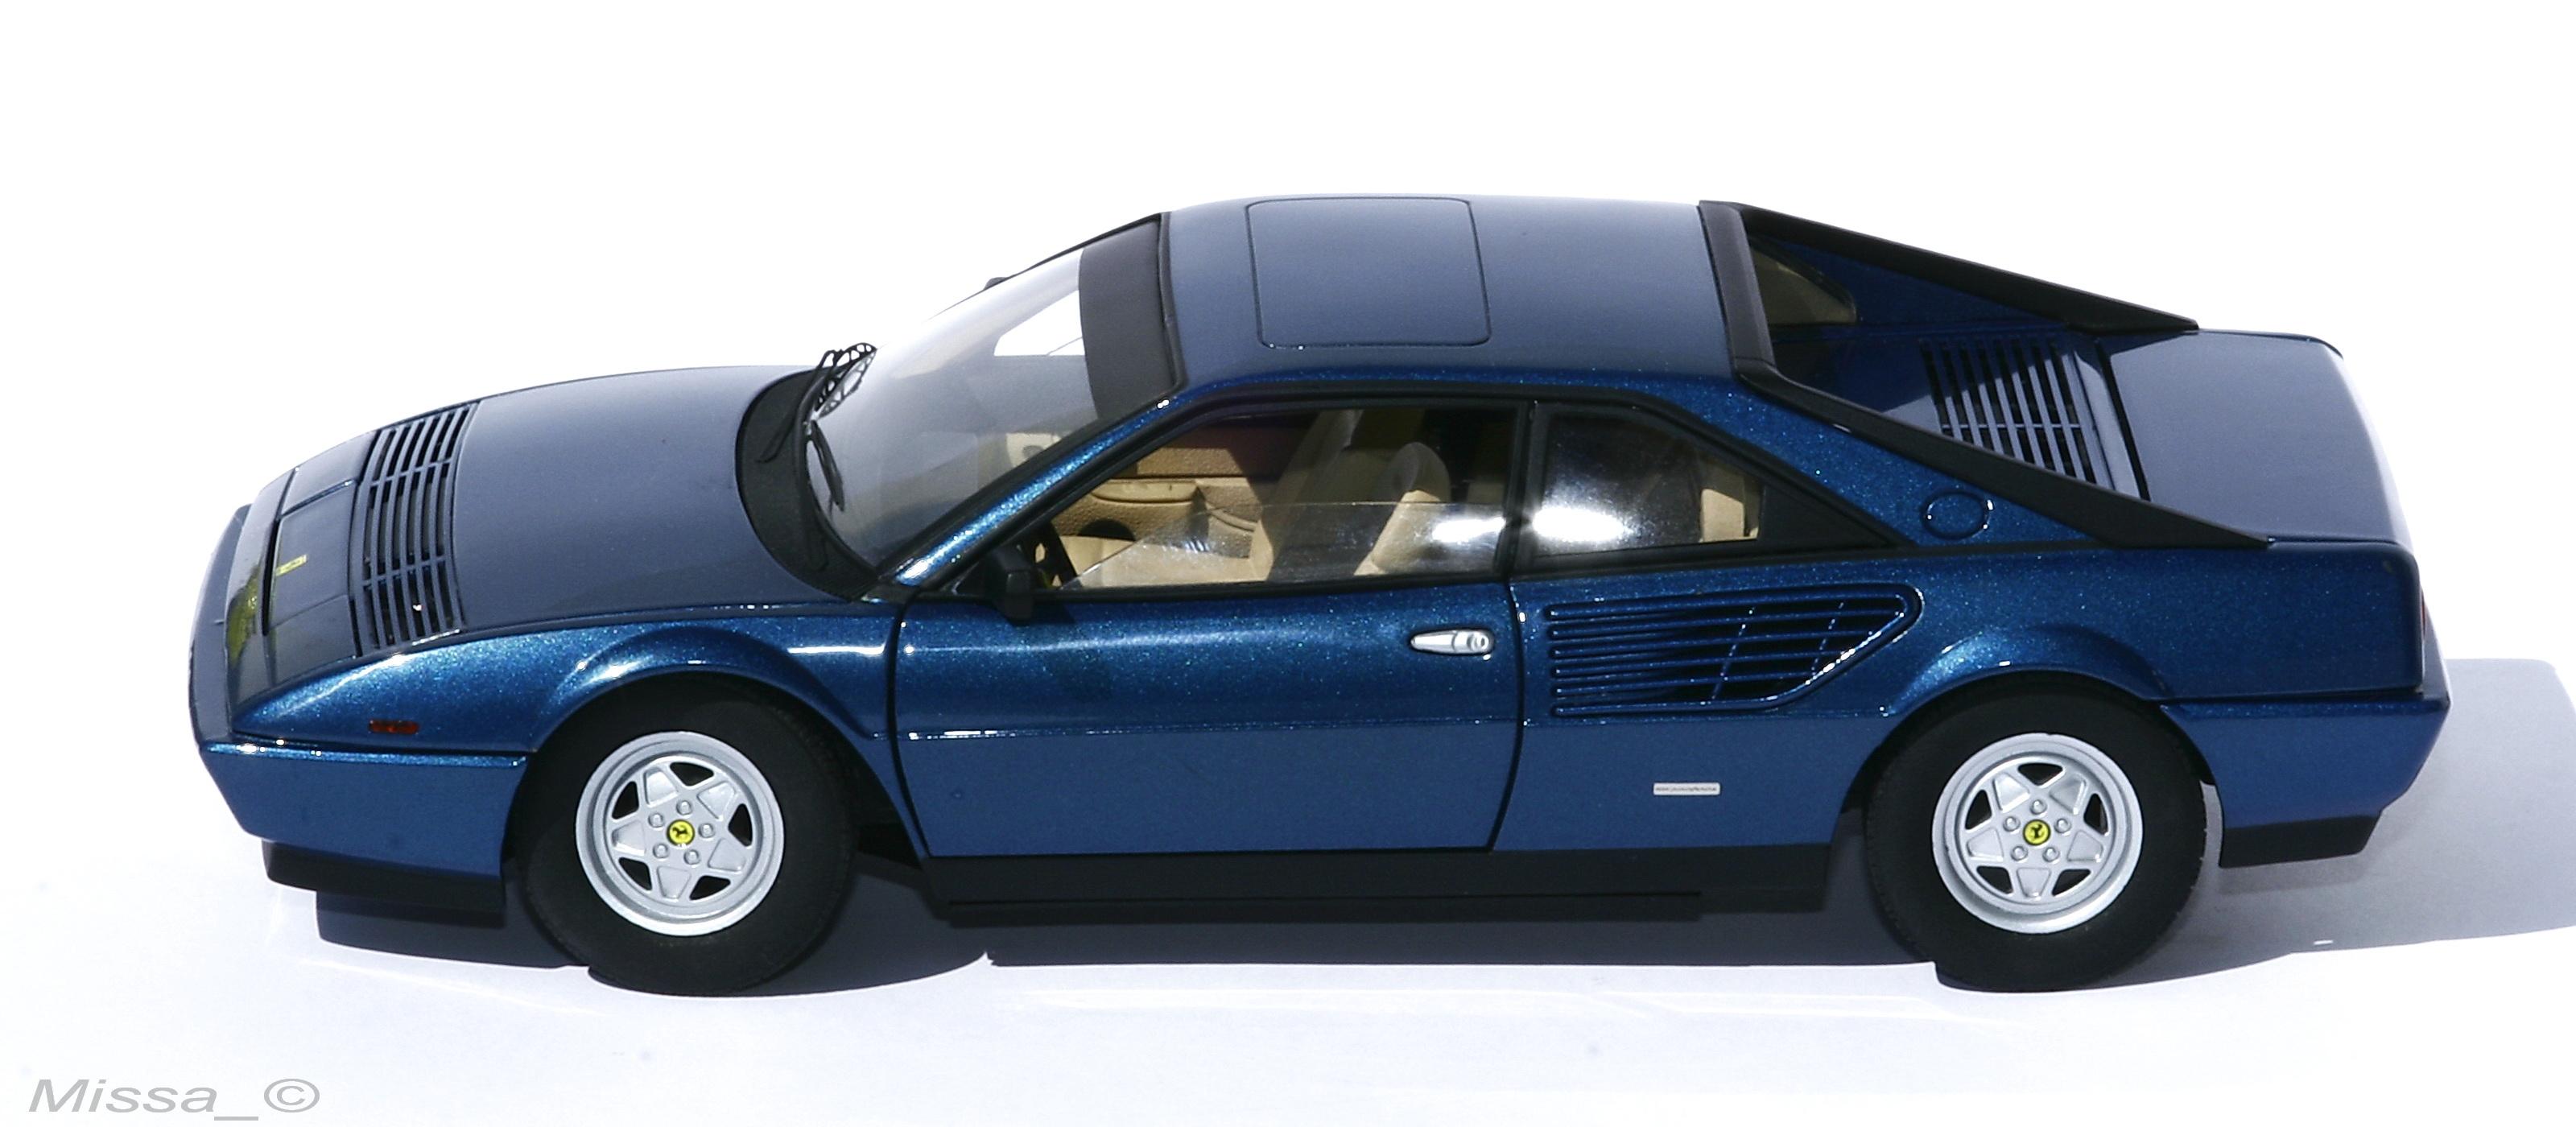 018_elite_ferrari_monu1kmx Fabulous Ferrari Mondial 8 Super Elite Cars Trend